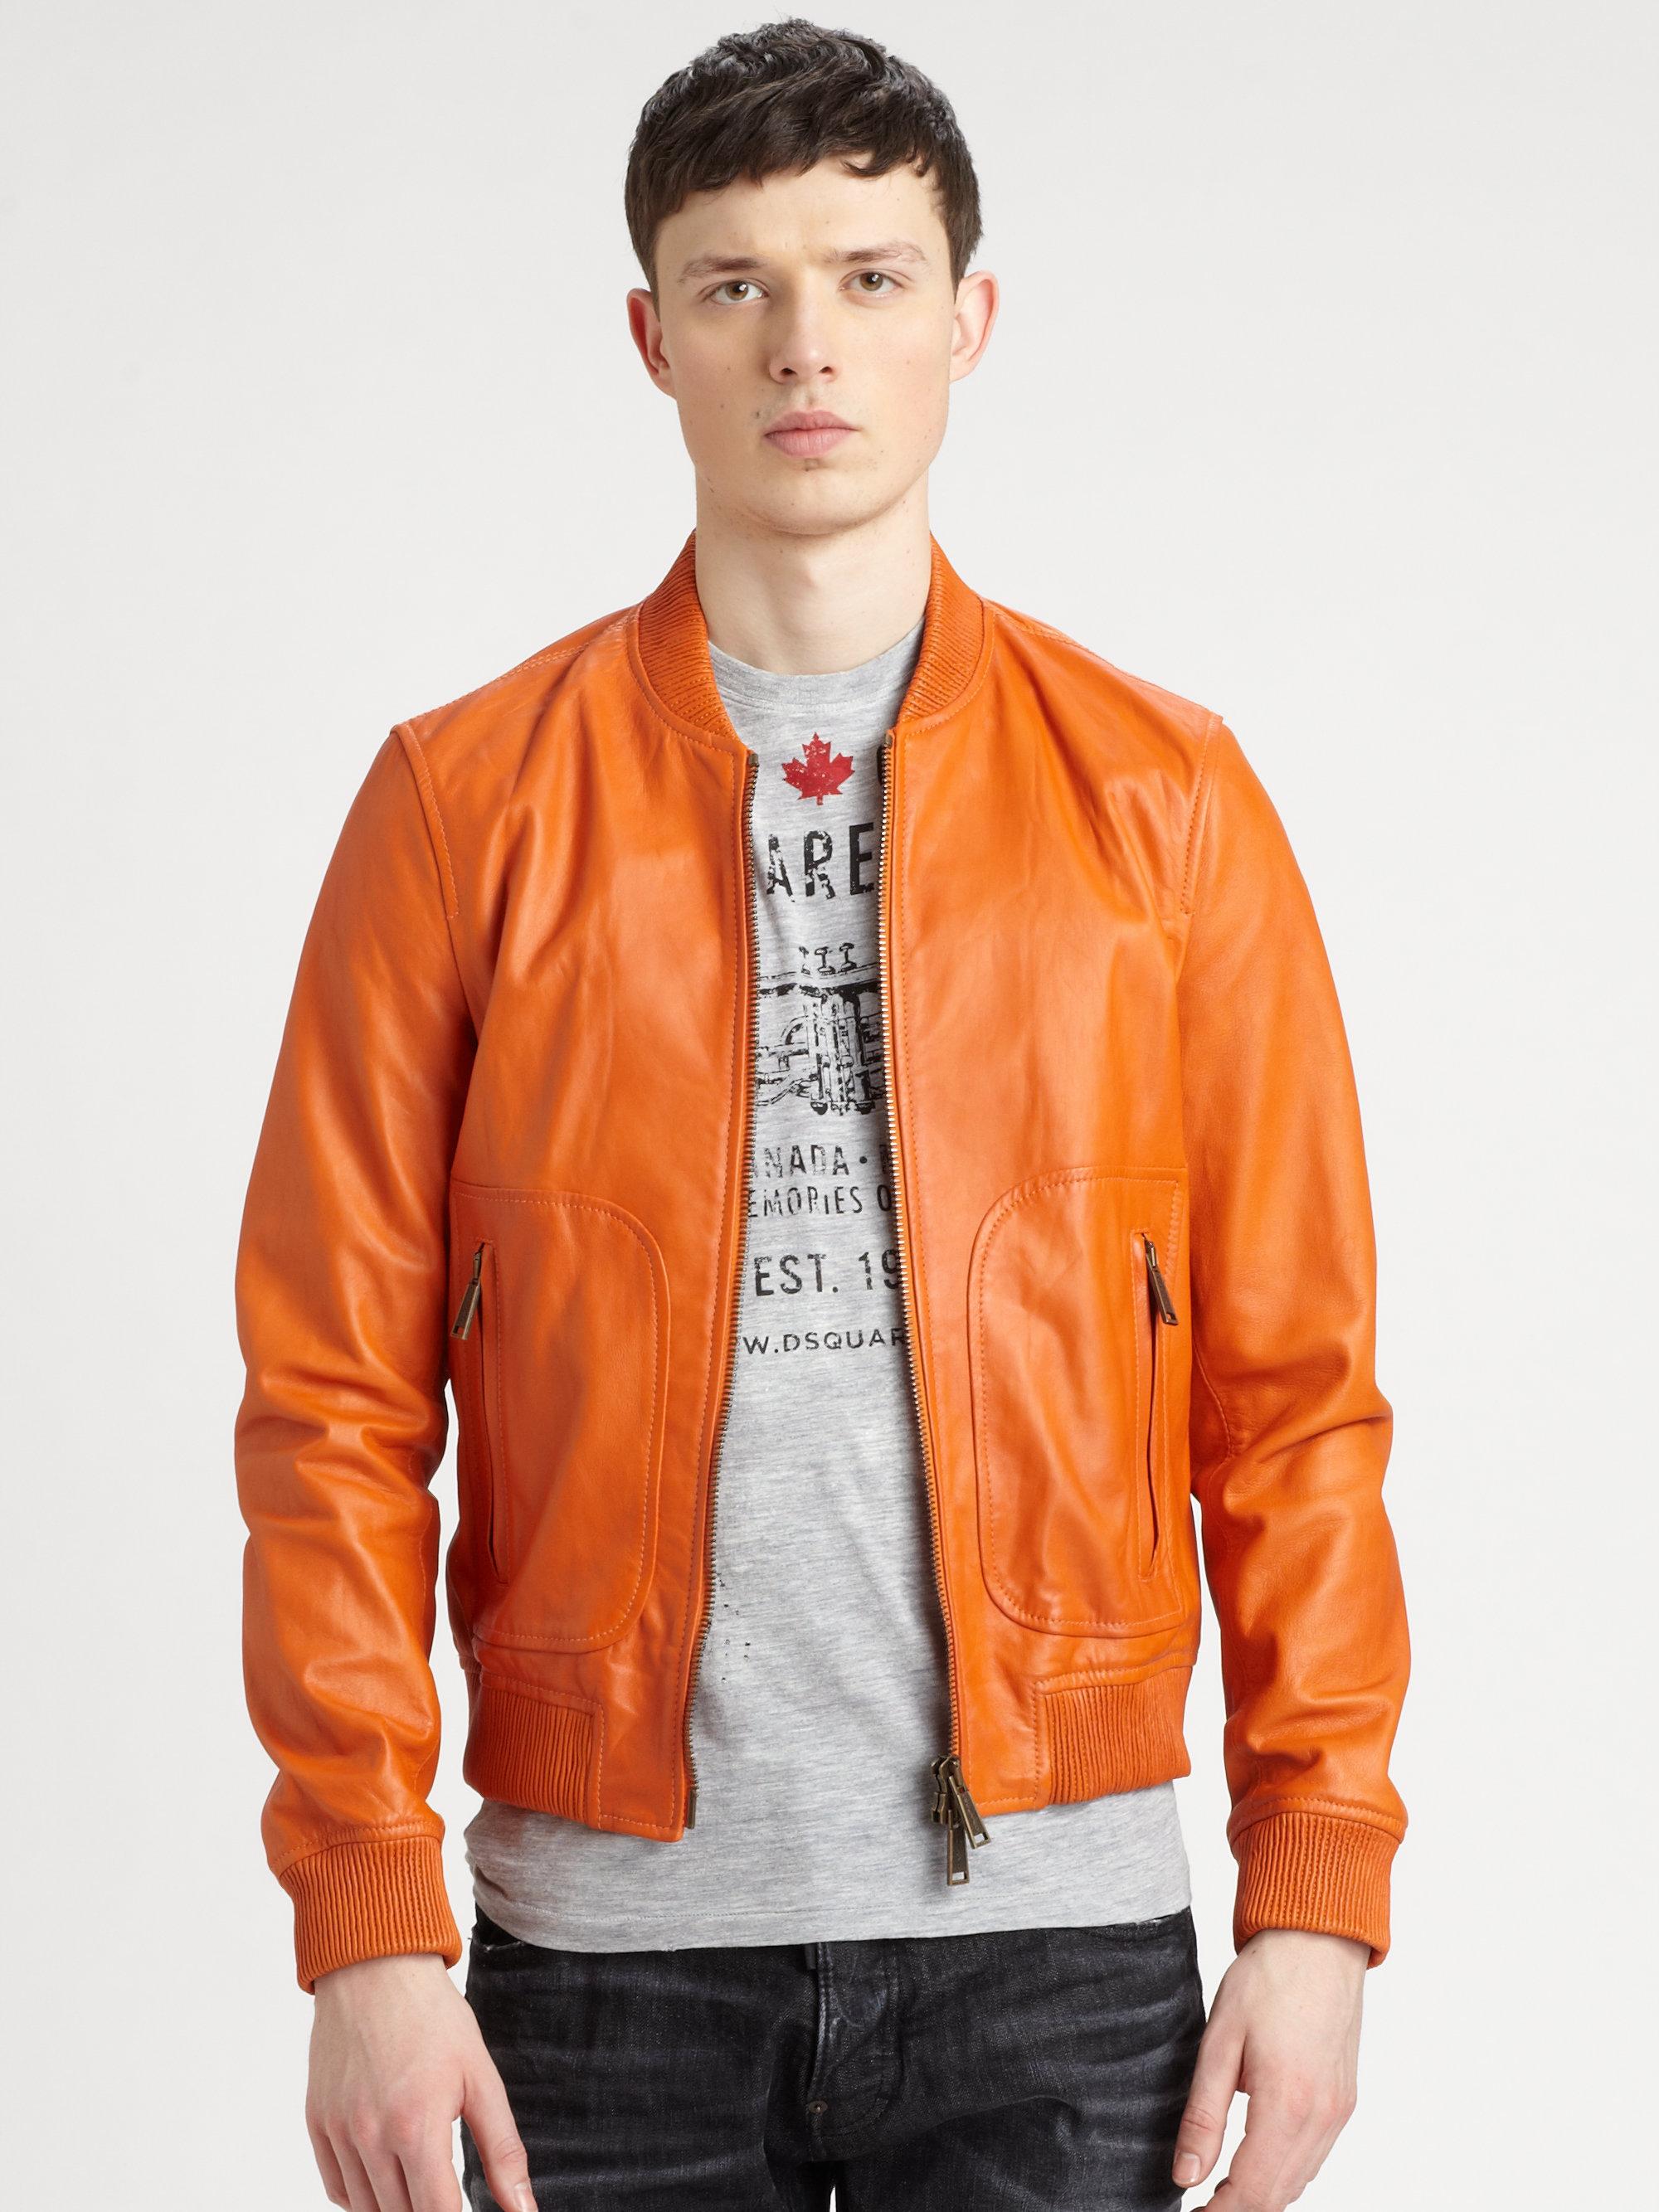 dsquared orange jacket | Dsquared Greece